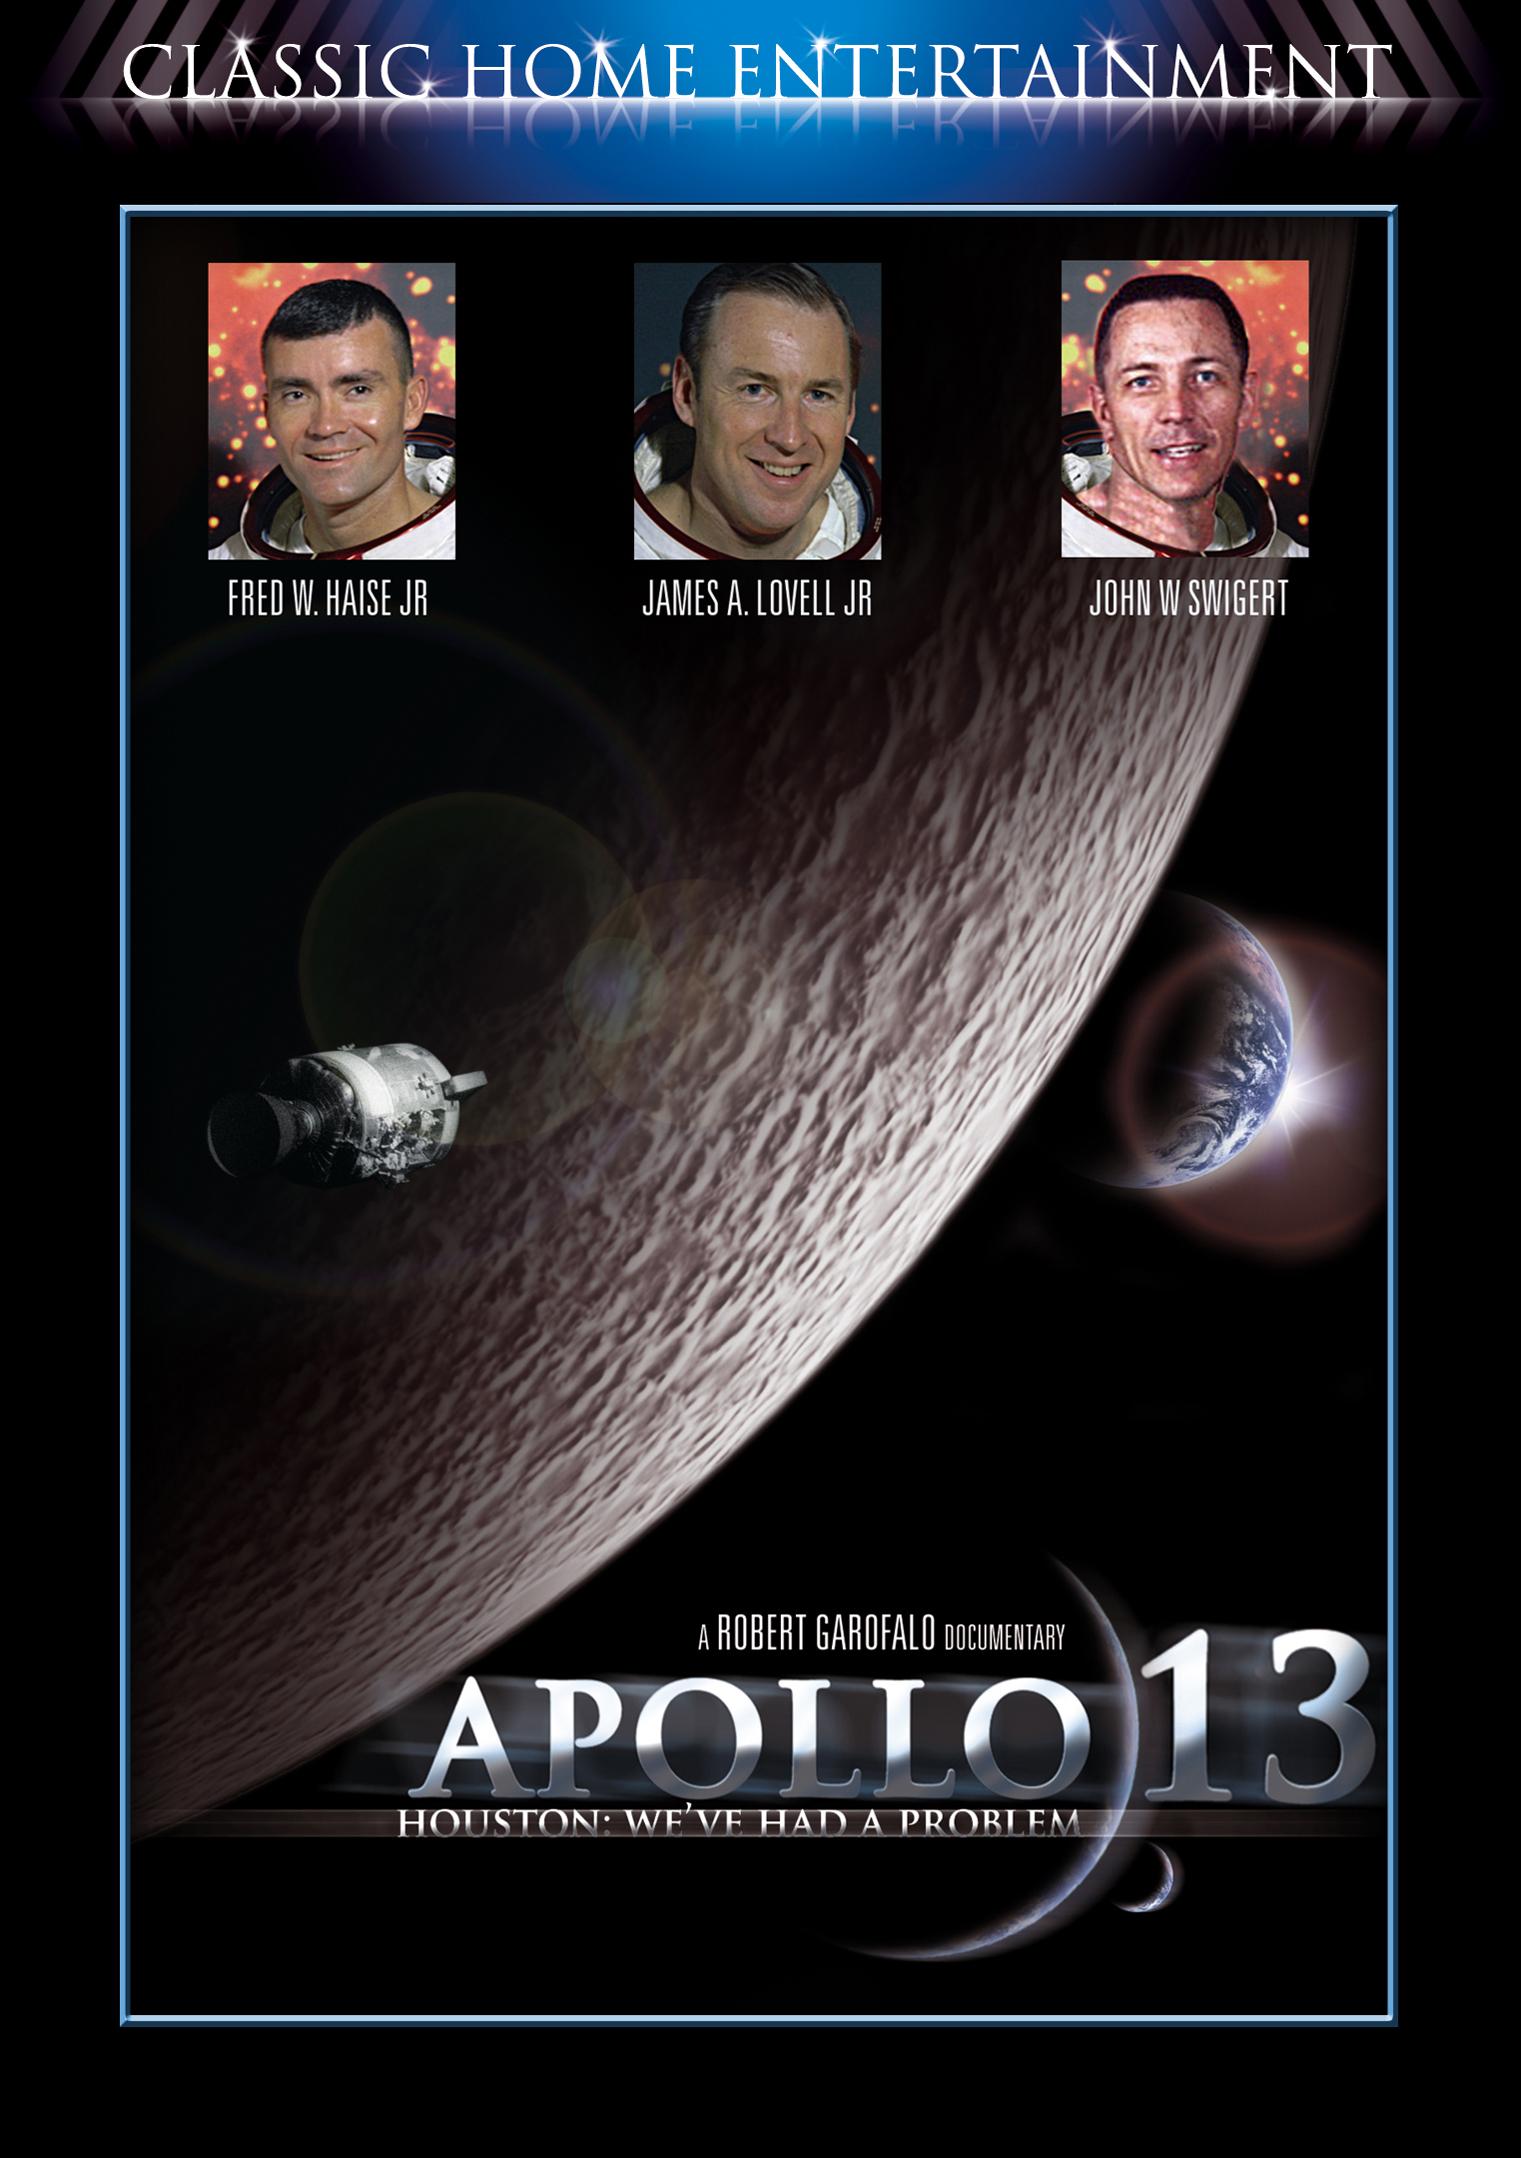 Apollo 13: Houston We've Had A Problem - MVD Entertainment Group B2B